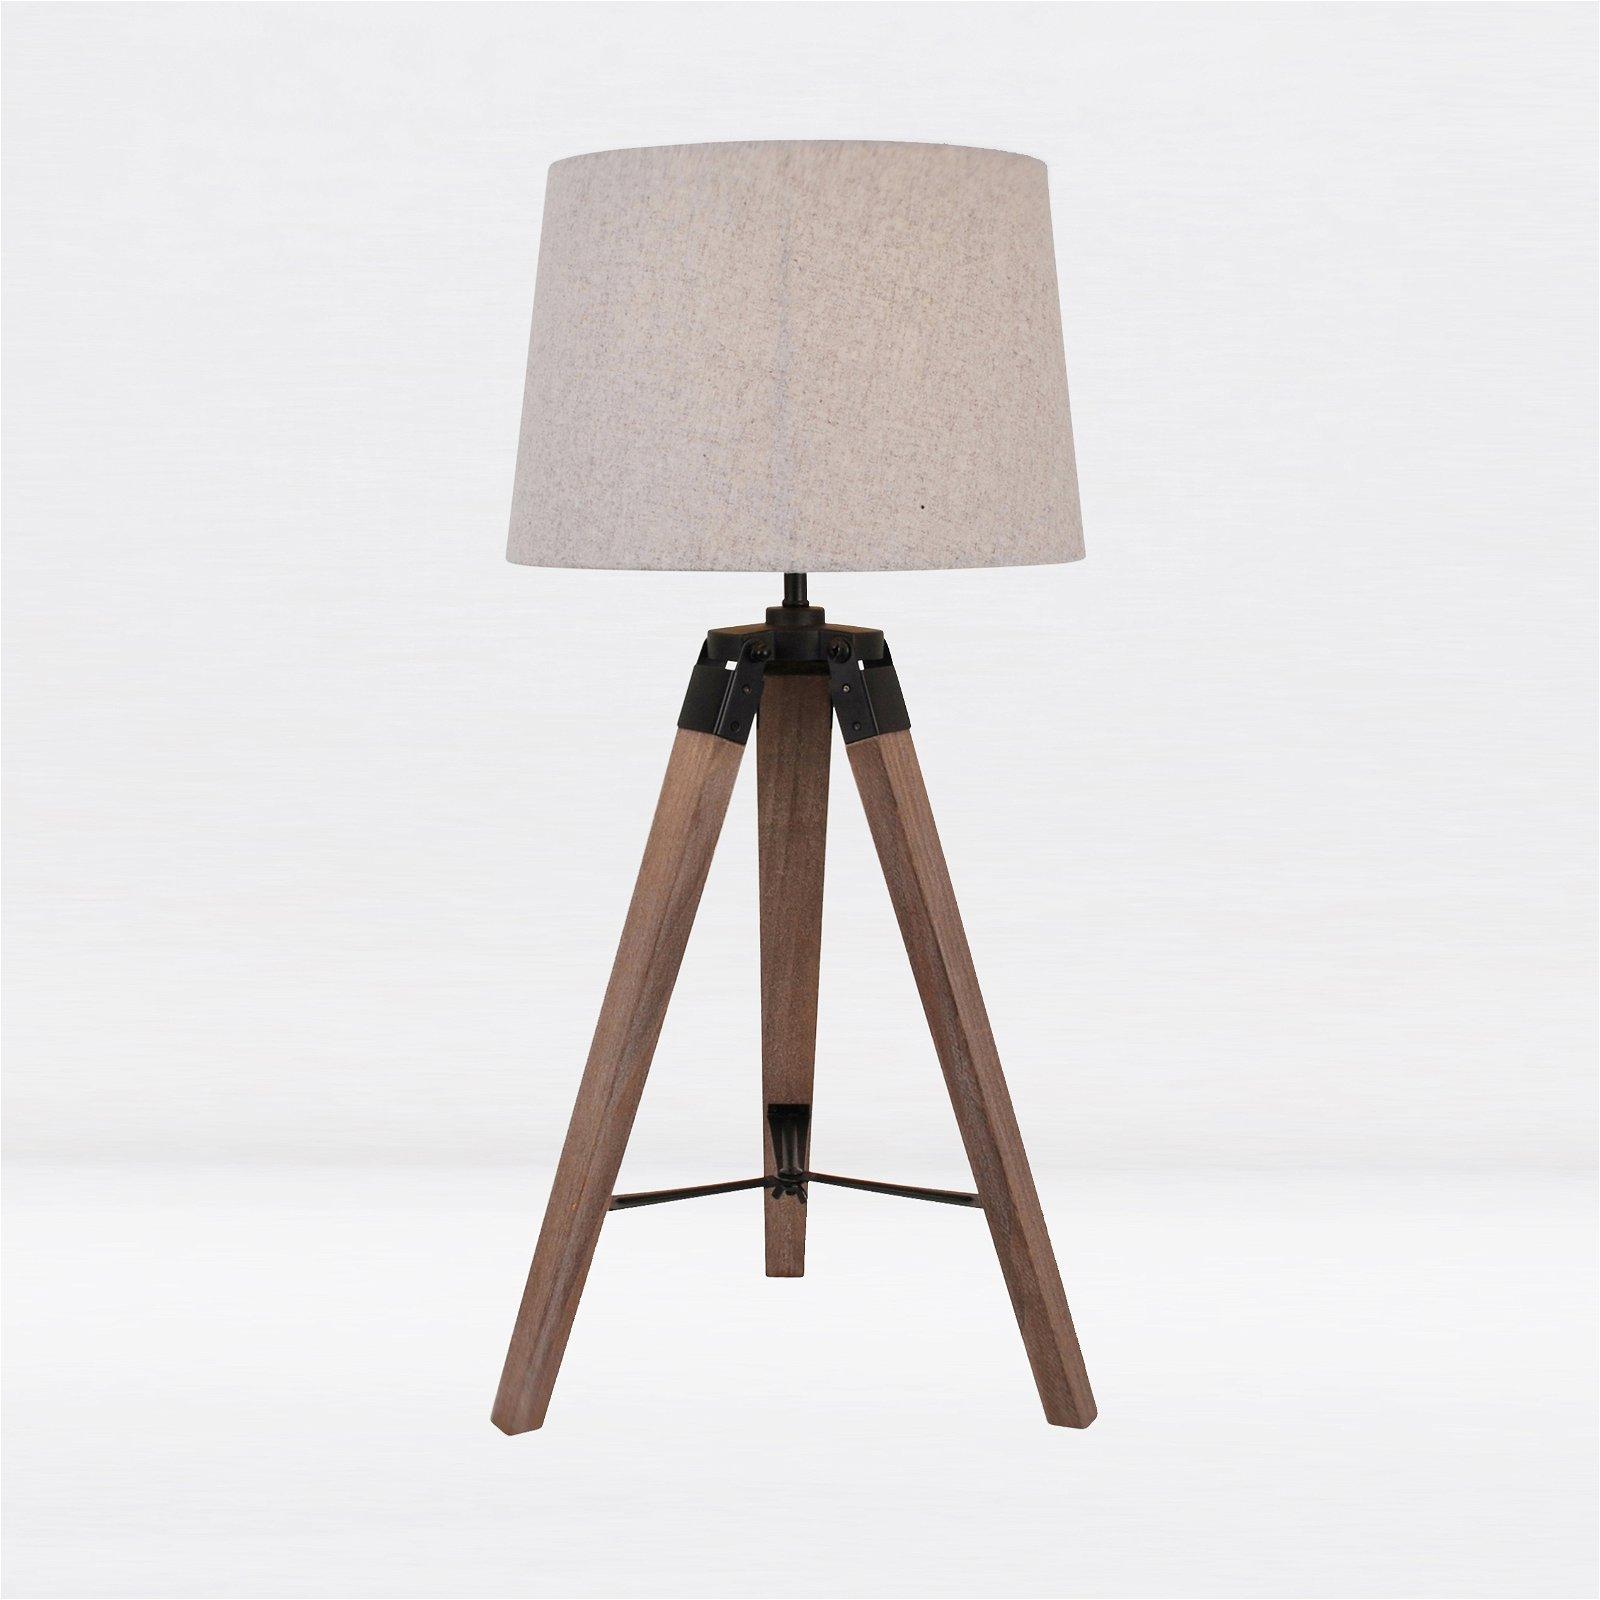 thumbnail 6 - Grey Wash Tripod Wood Table or Floor Lamp Black Painted Metal and Grey Shade